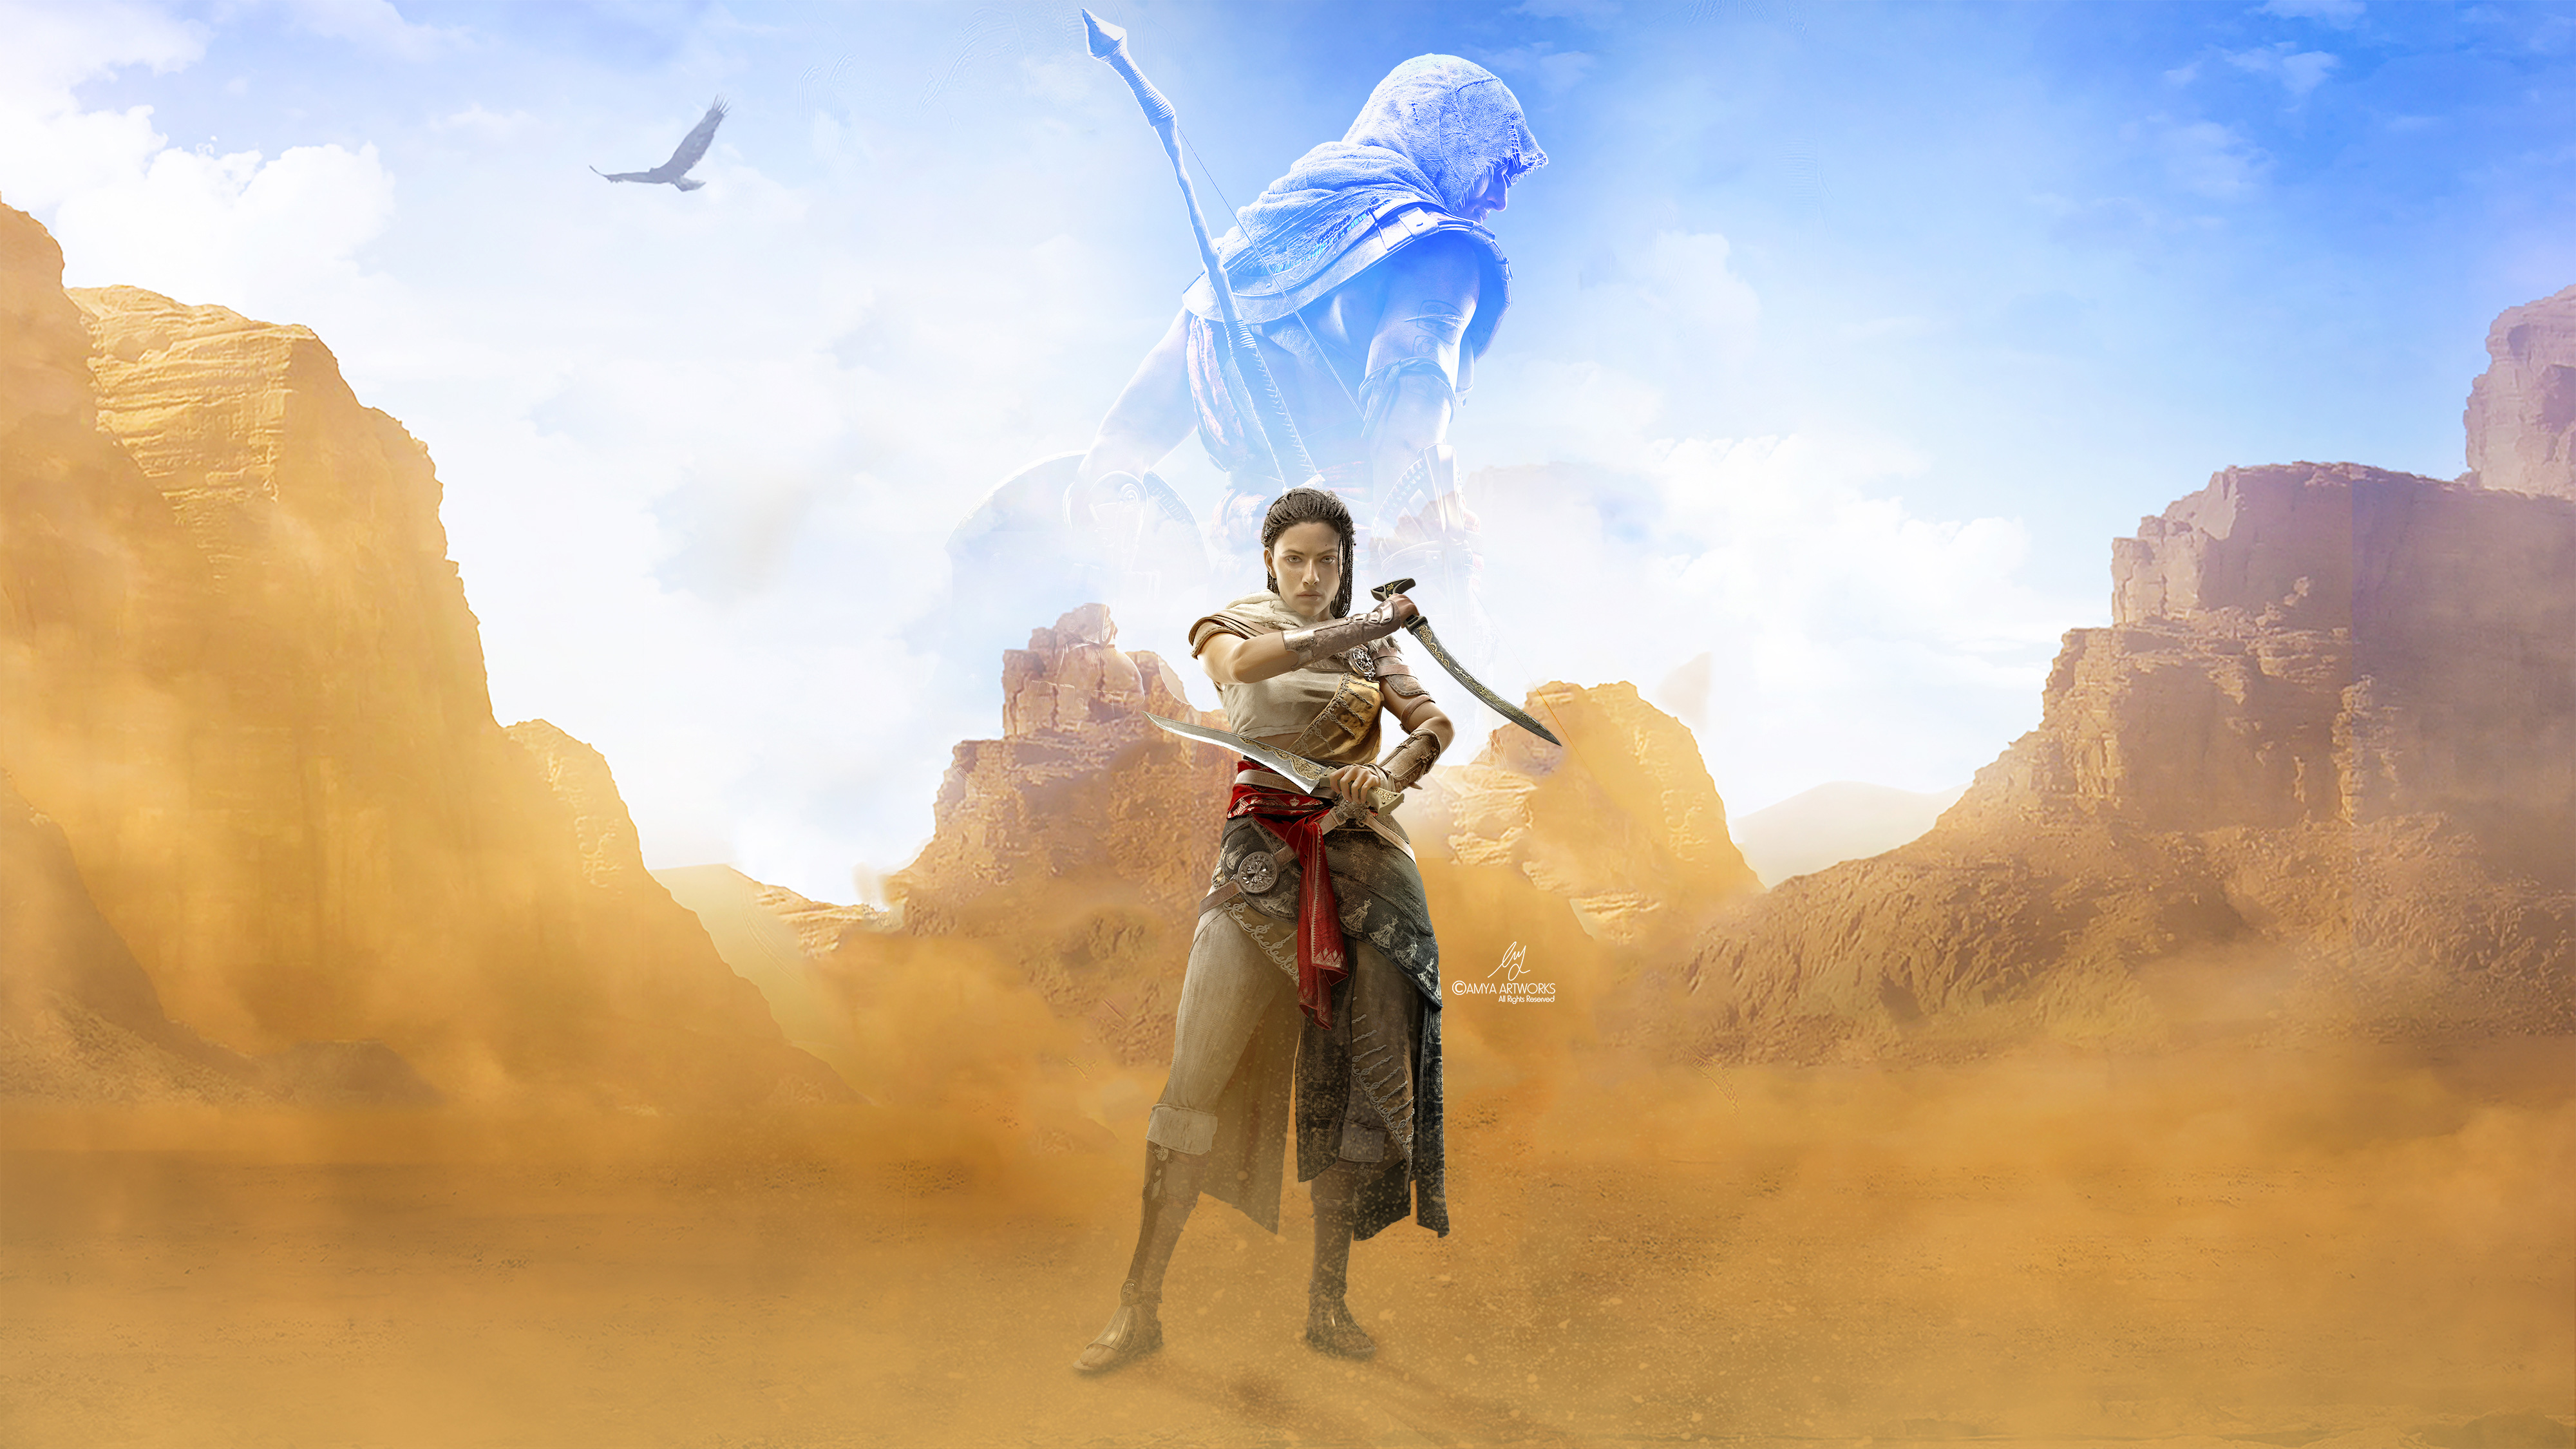 Assassins Creed Origins Wallpaper: 4k Assassins Creed Origins Game, HD Games, 4k Wallpapers